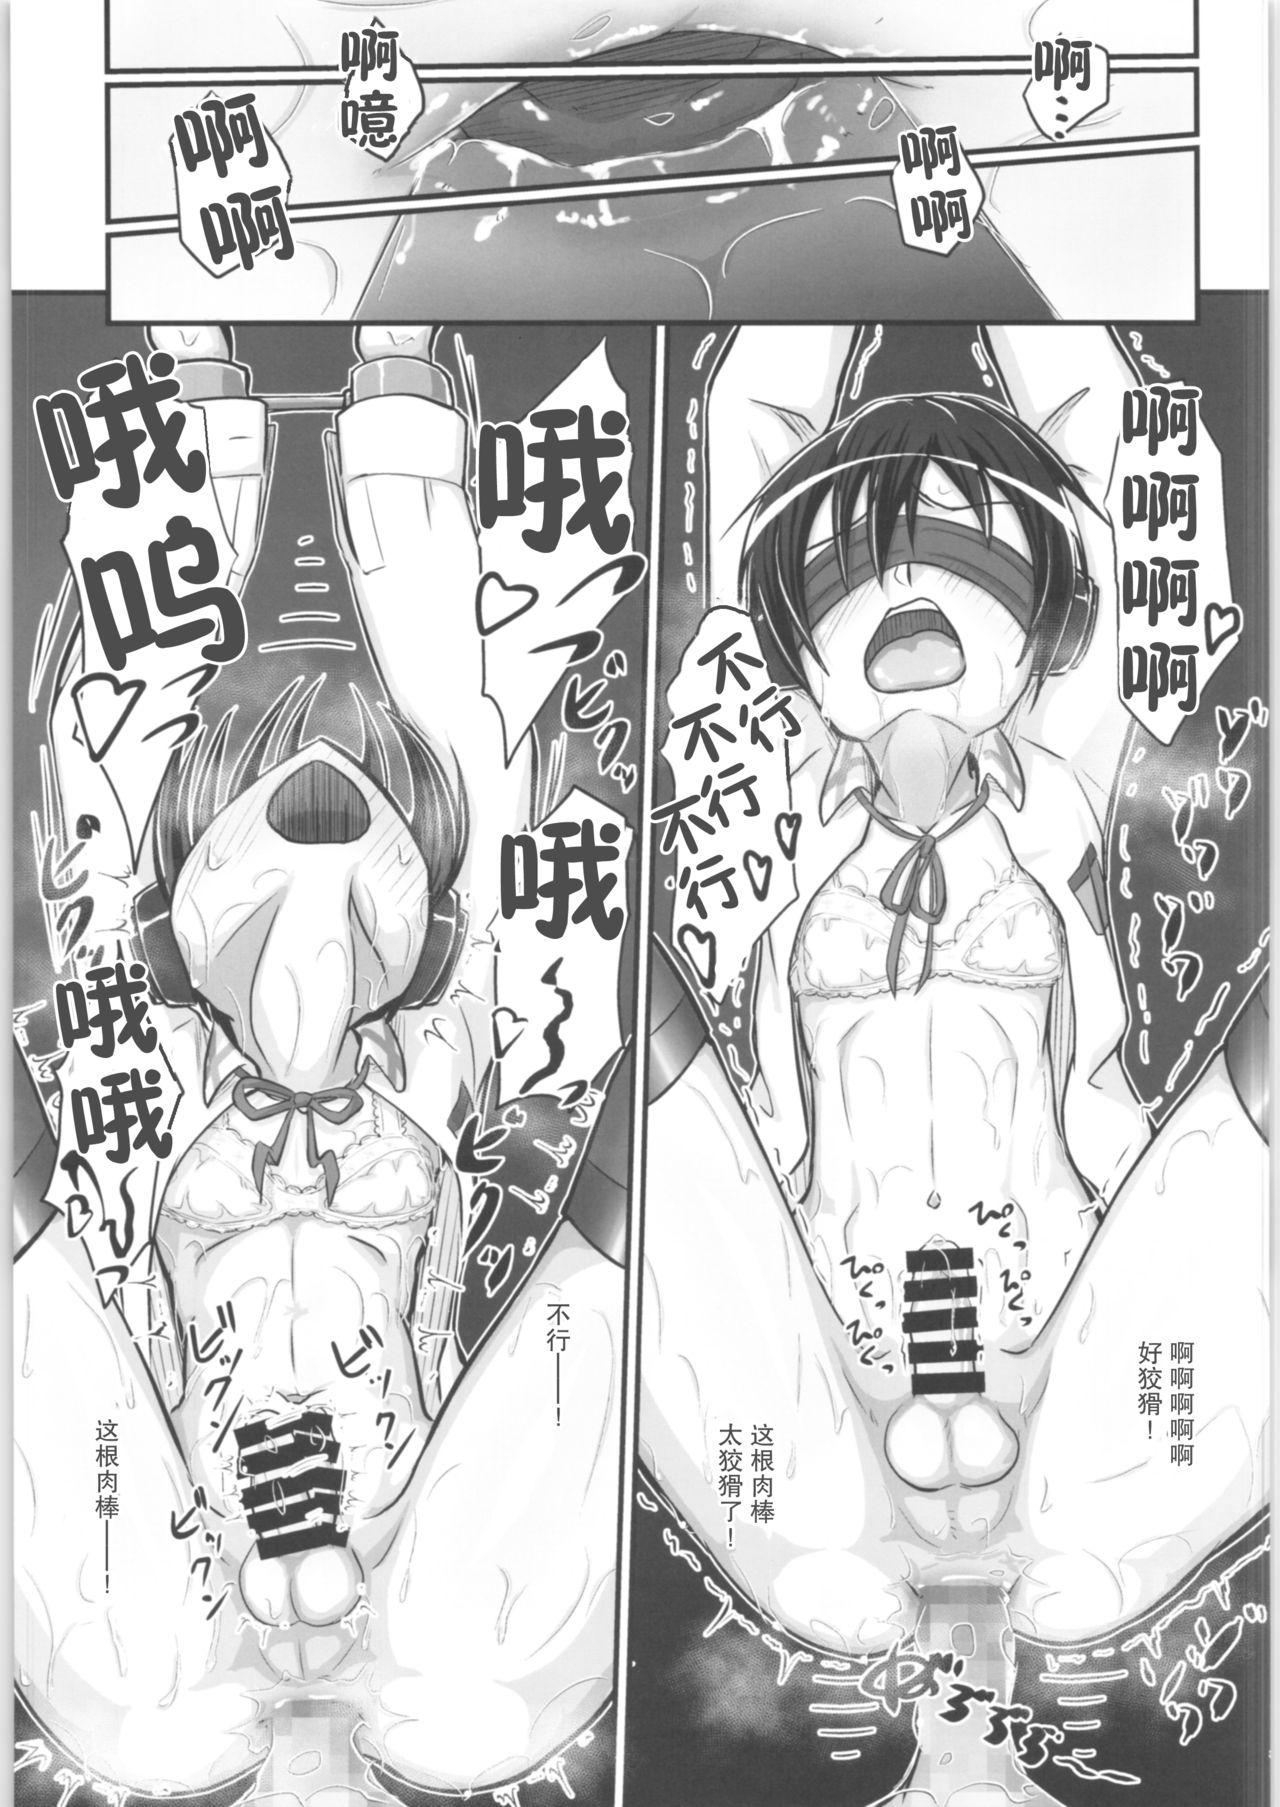 [Umari-ya (D-2)] Kiriko Route Another #05 ~Seifuku Josou Anal Junchi Hen~ (Sword Art Online) ) [Chinese] [不可视汉化] 36